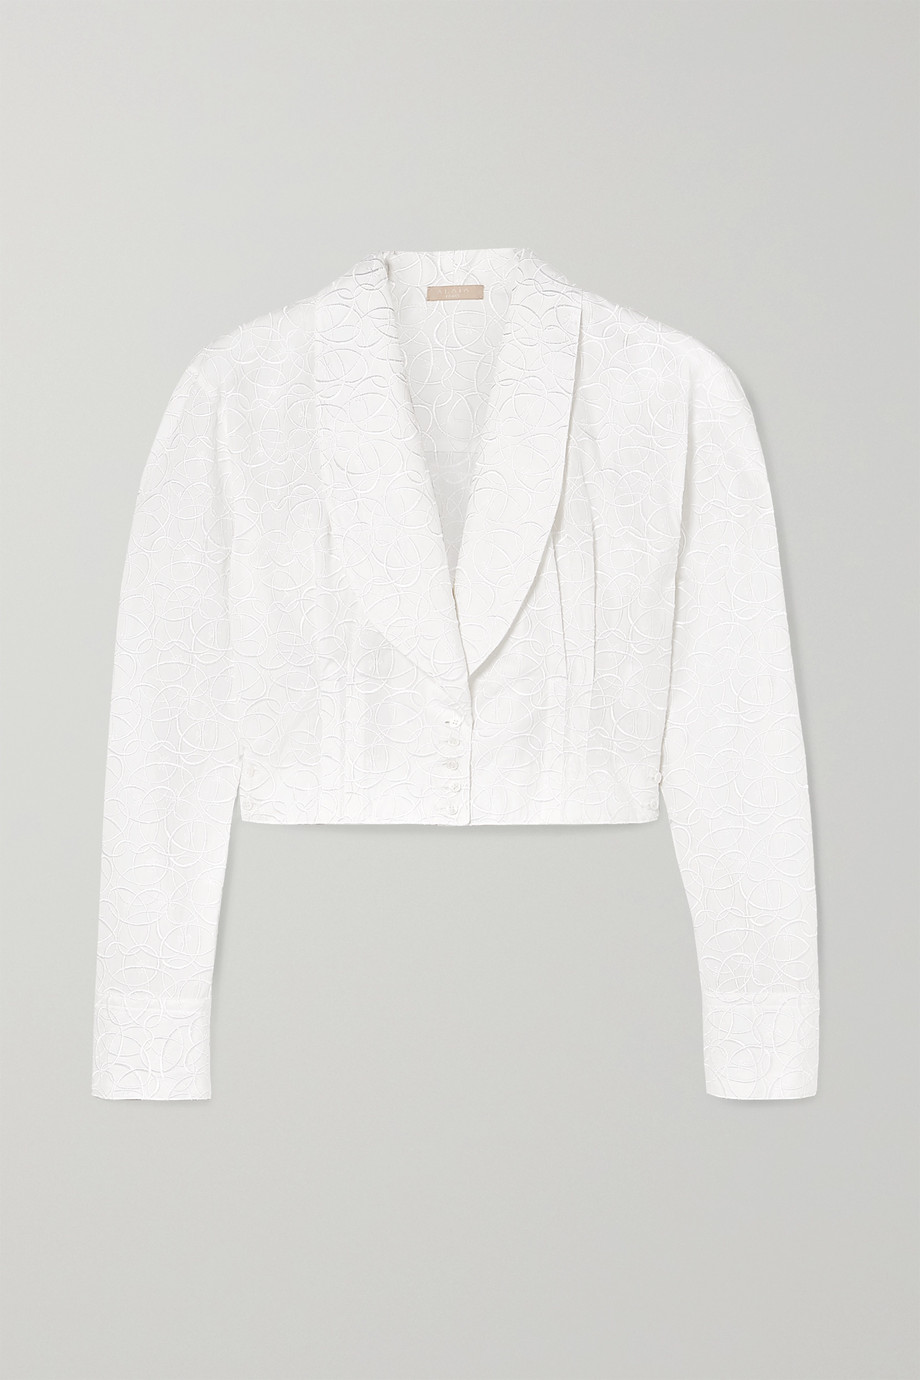 Alaïa Cropped embroidered cotton-poplin blouse